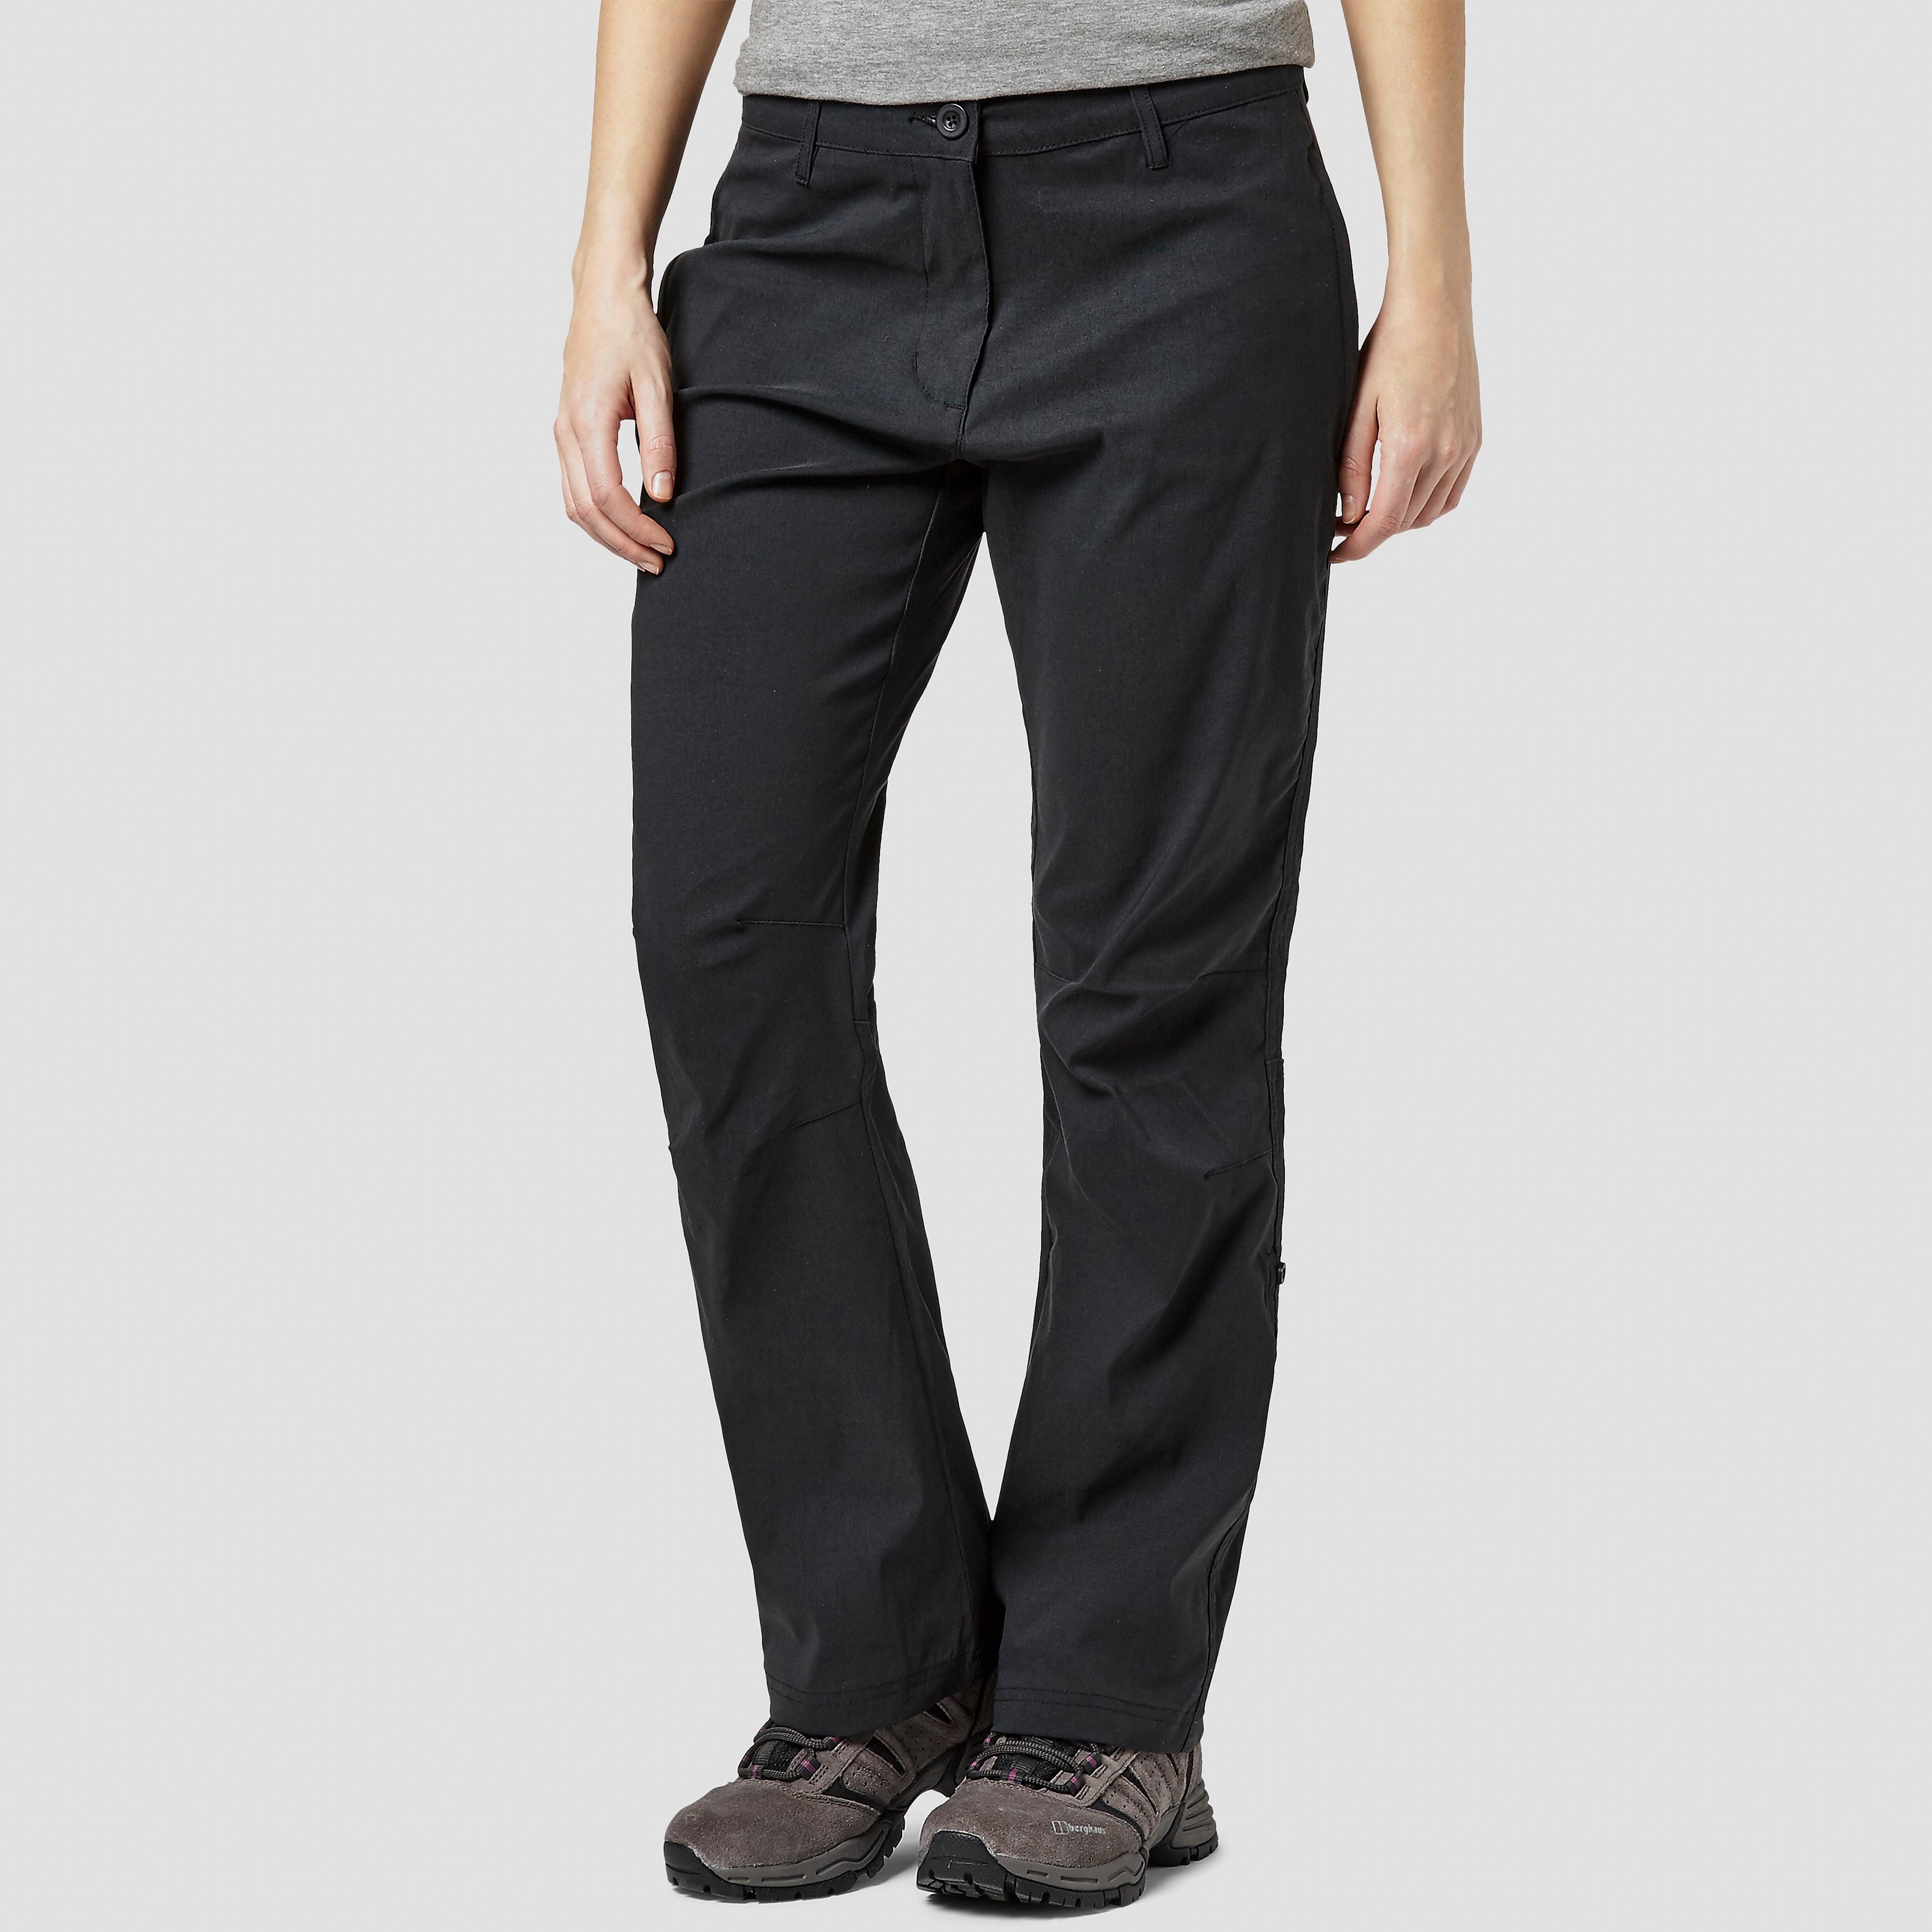 Peter Storm Women's Stretch Roll Up Trousers - Regular